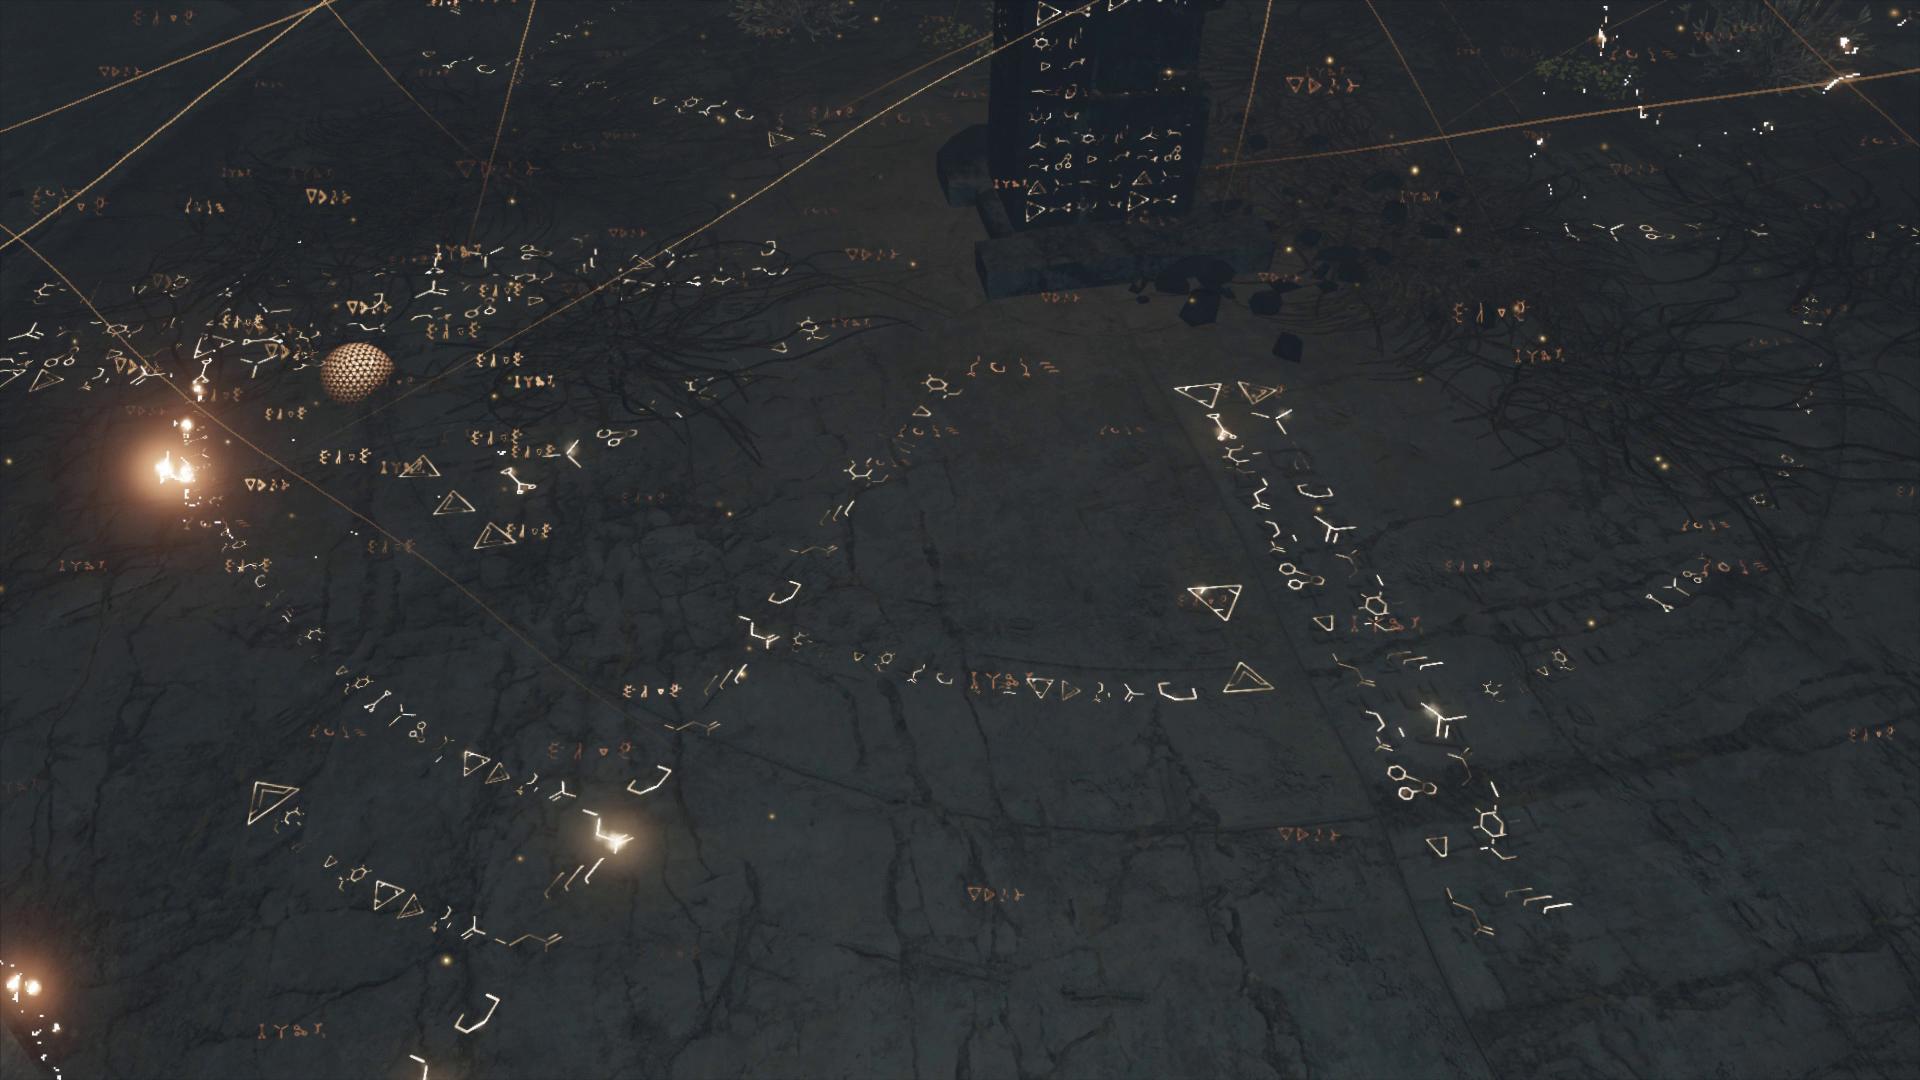 A Gaze Into The Nexus The Coded Language Of The Isu